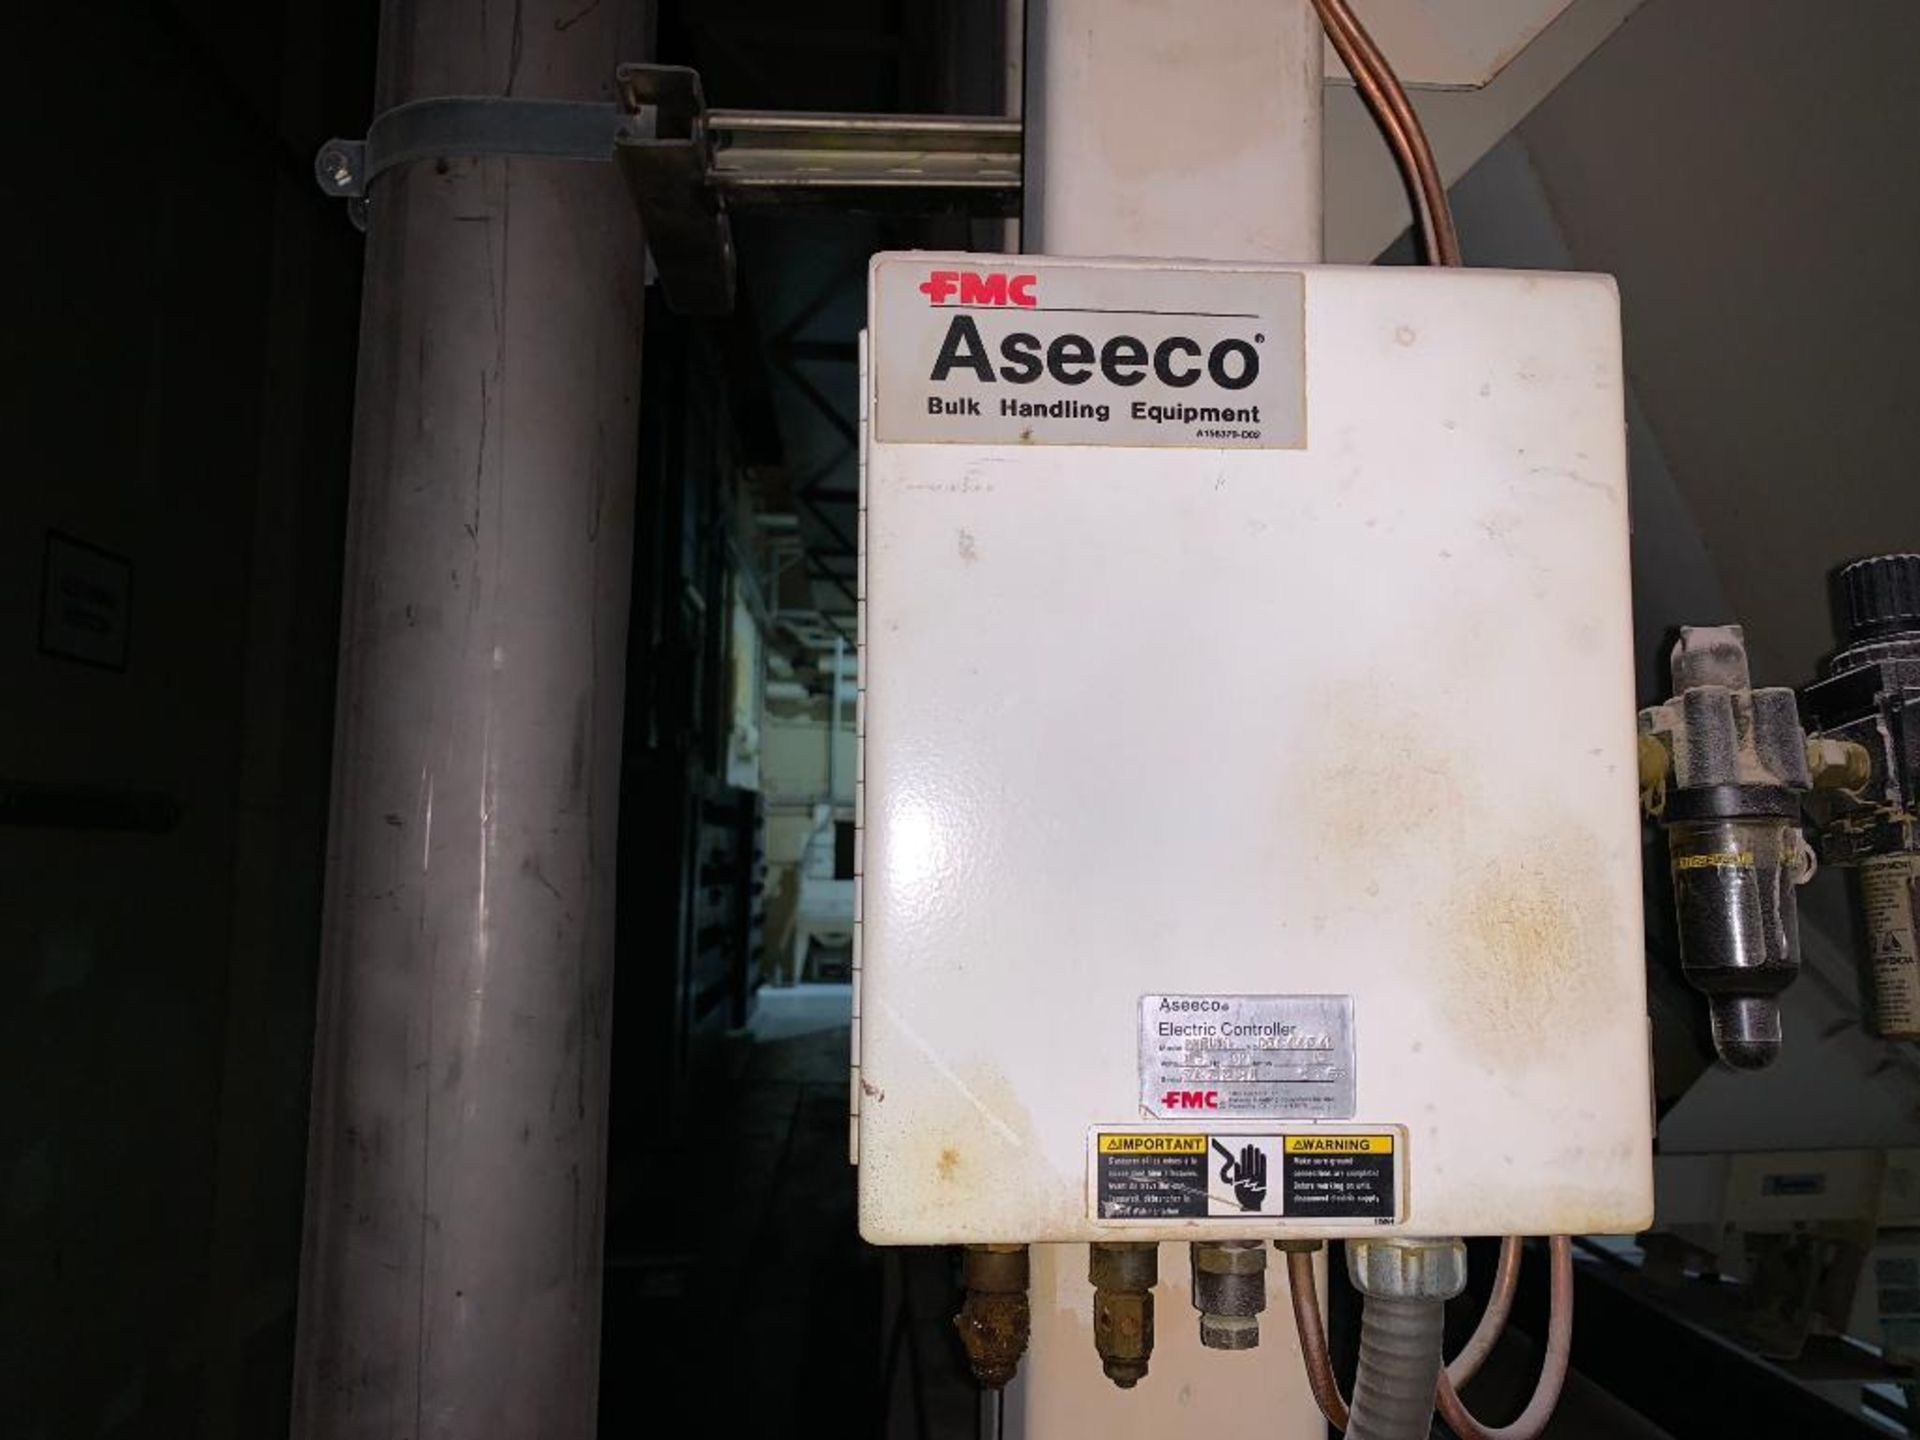 Aseeco mild steel cone bottom bulk storage bin - Image 18 of 19